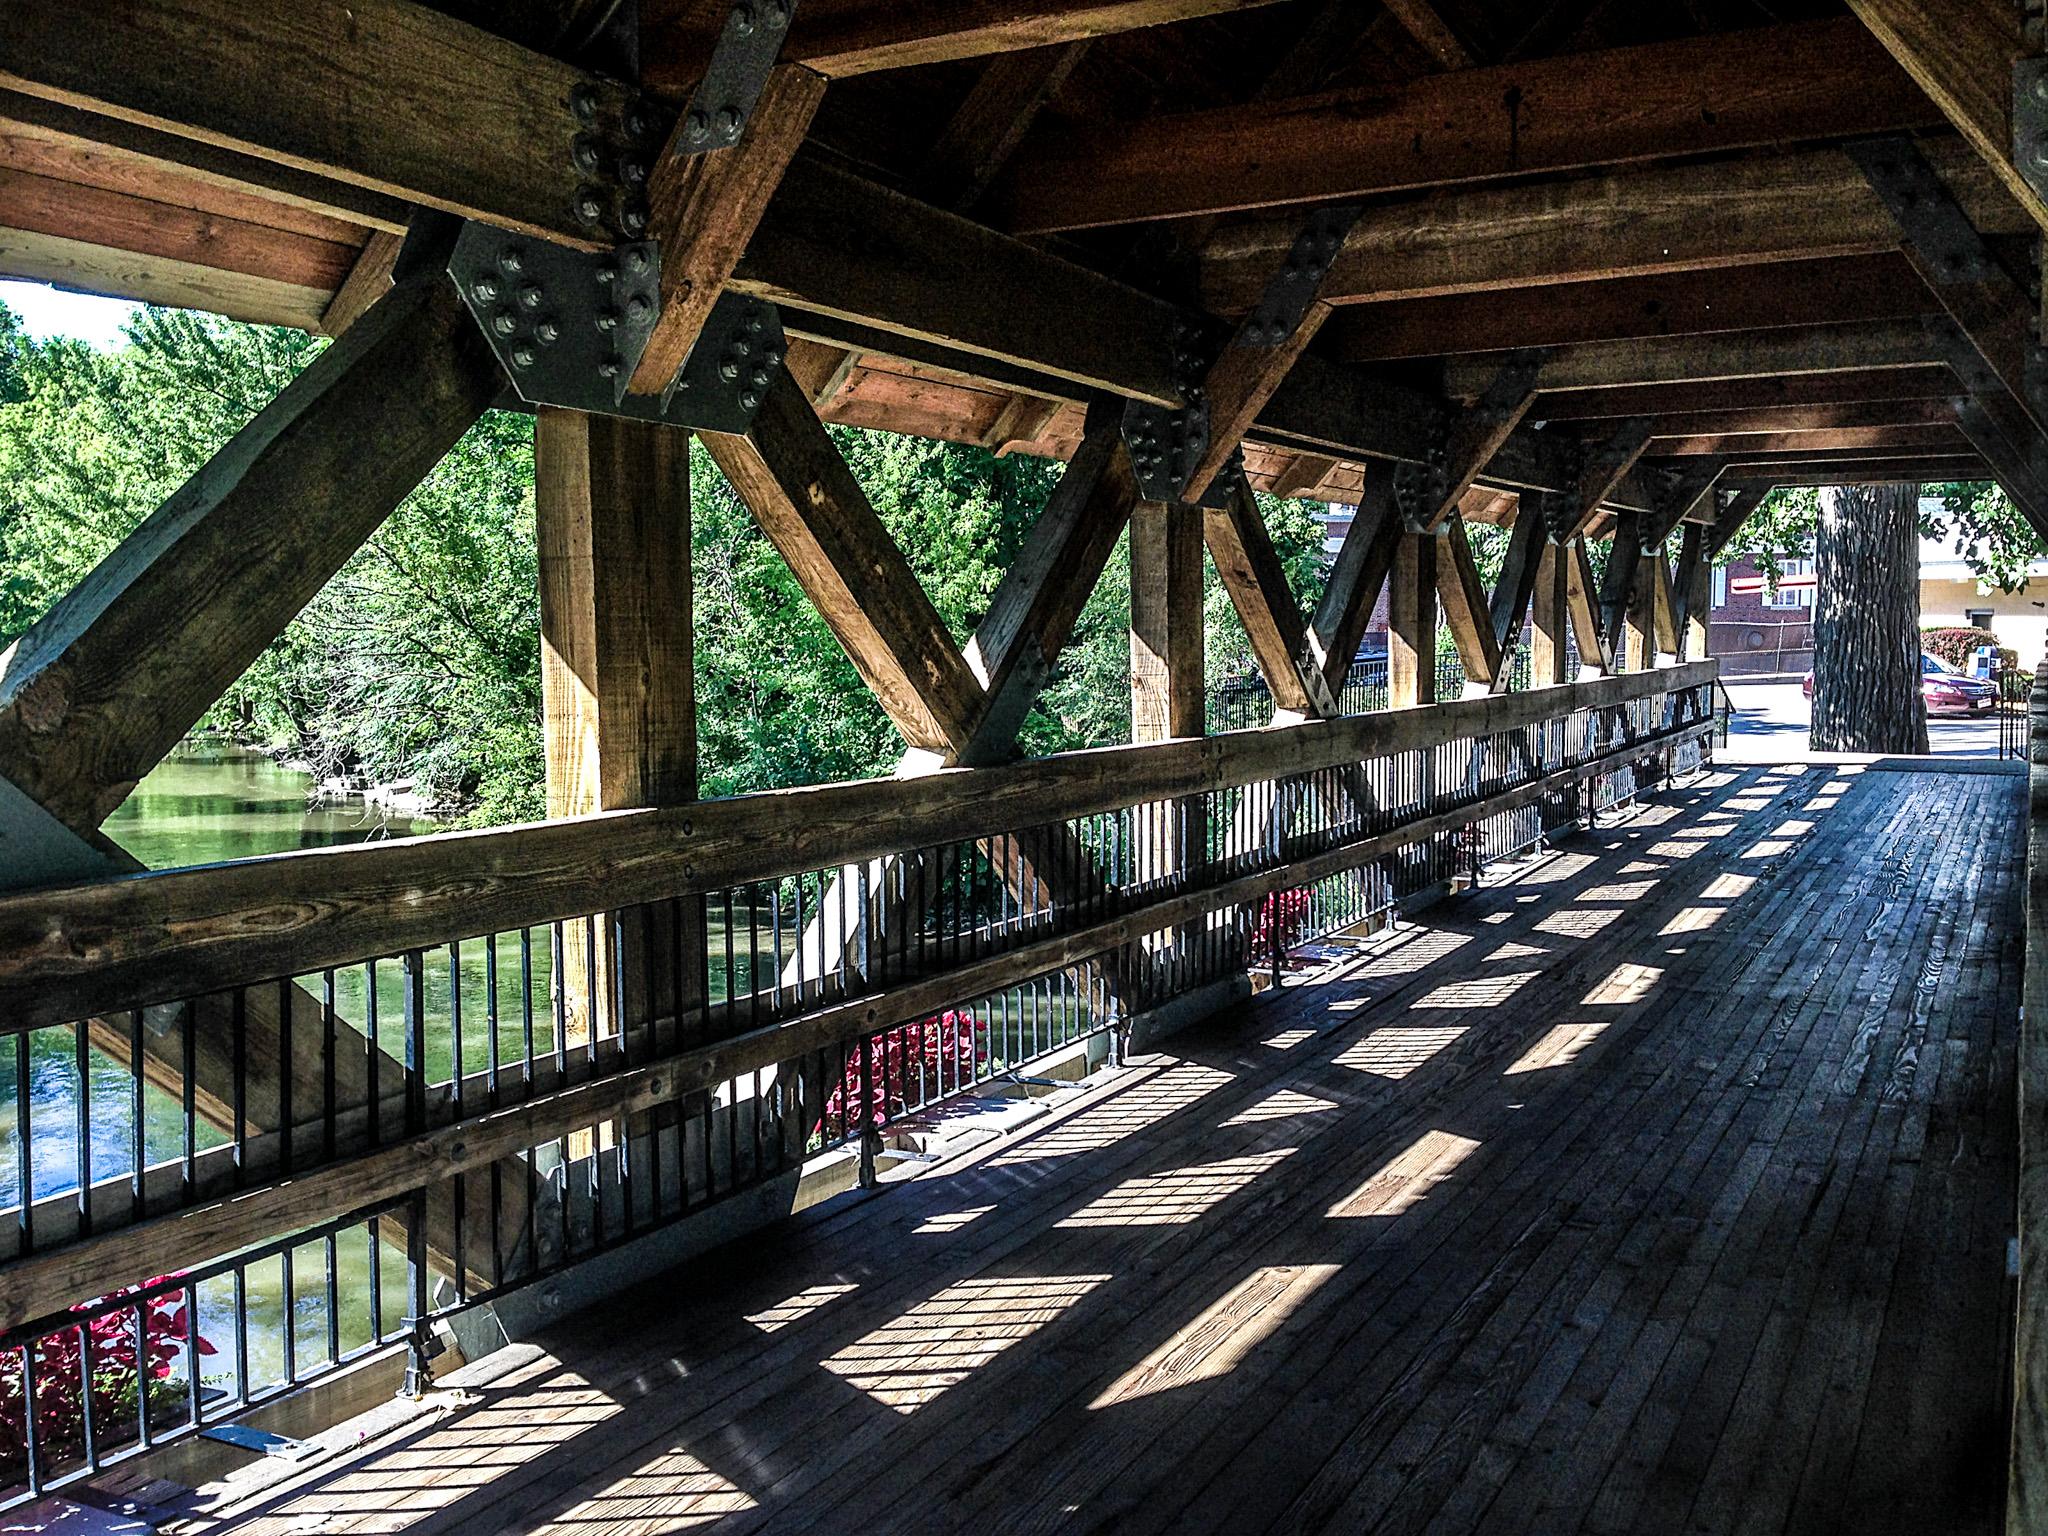 One o three covered bridges along the RiverWalk